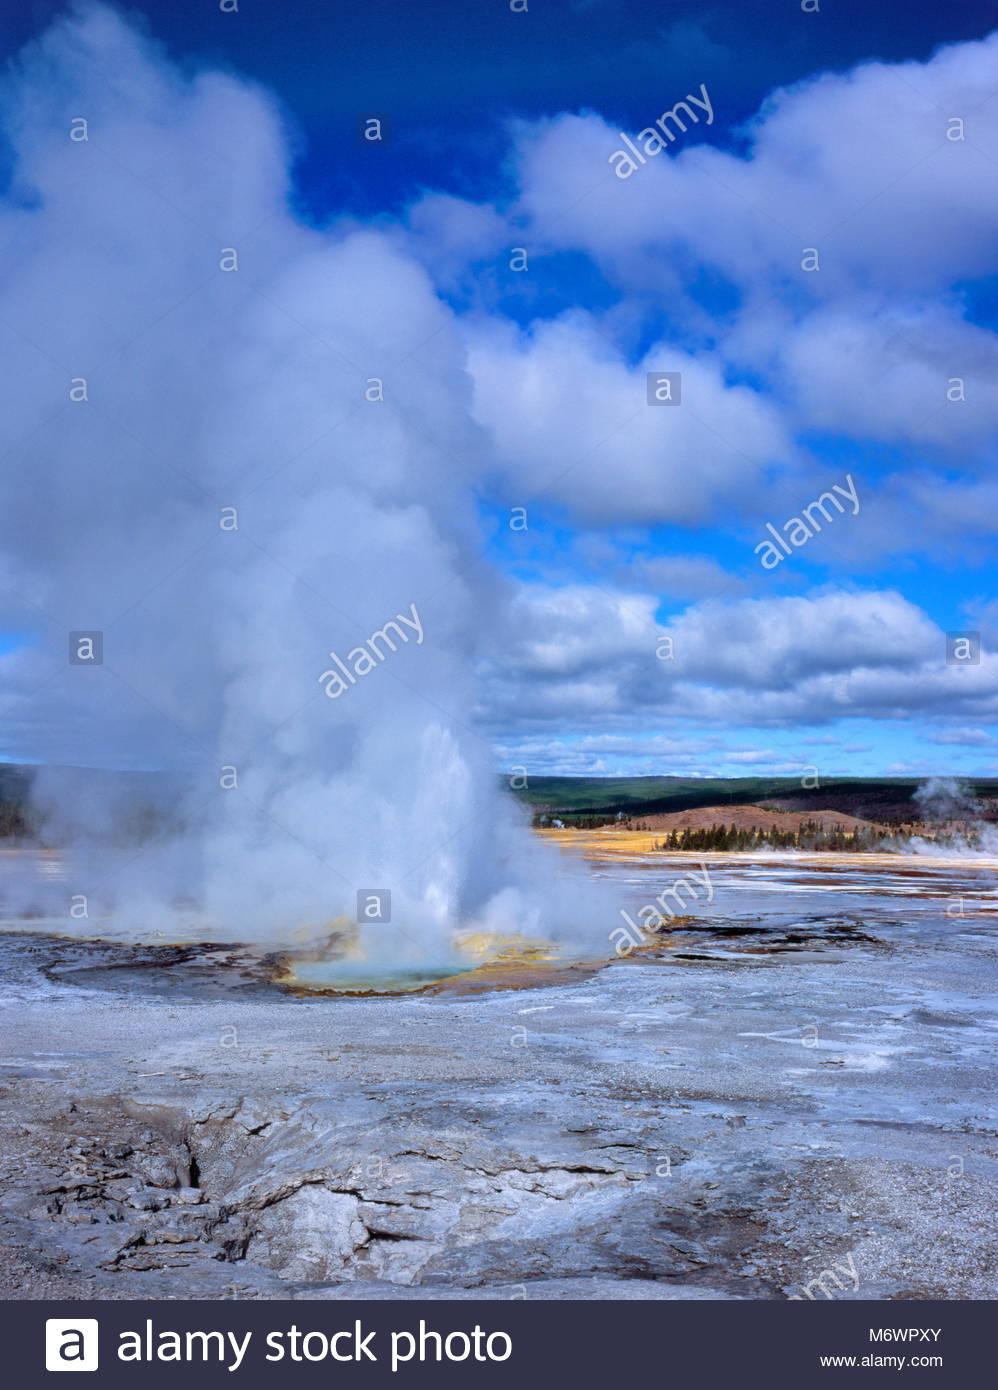 Clepsydra Geyser, Fountain Paint Pot Basin, Yellowstone National Park, Wyoming - Stock Image